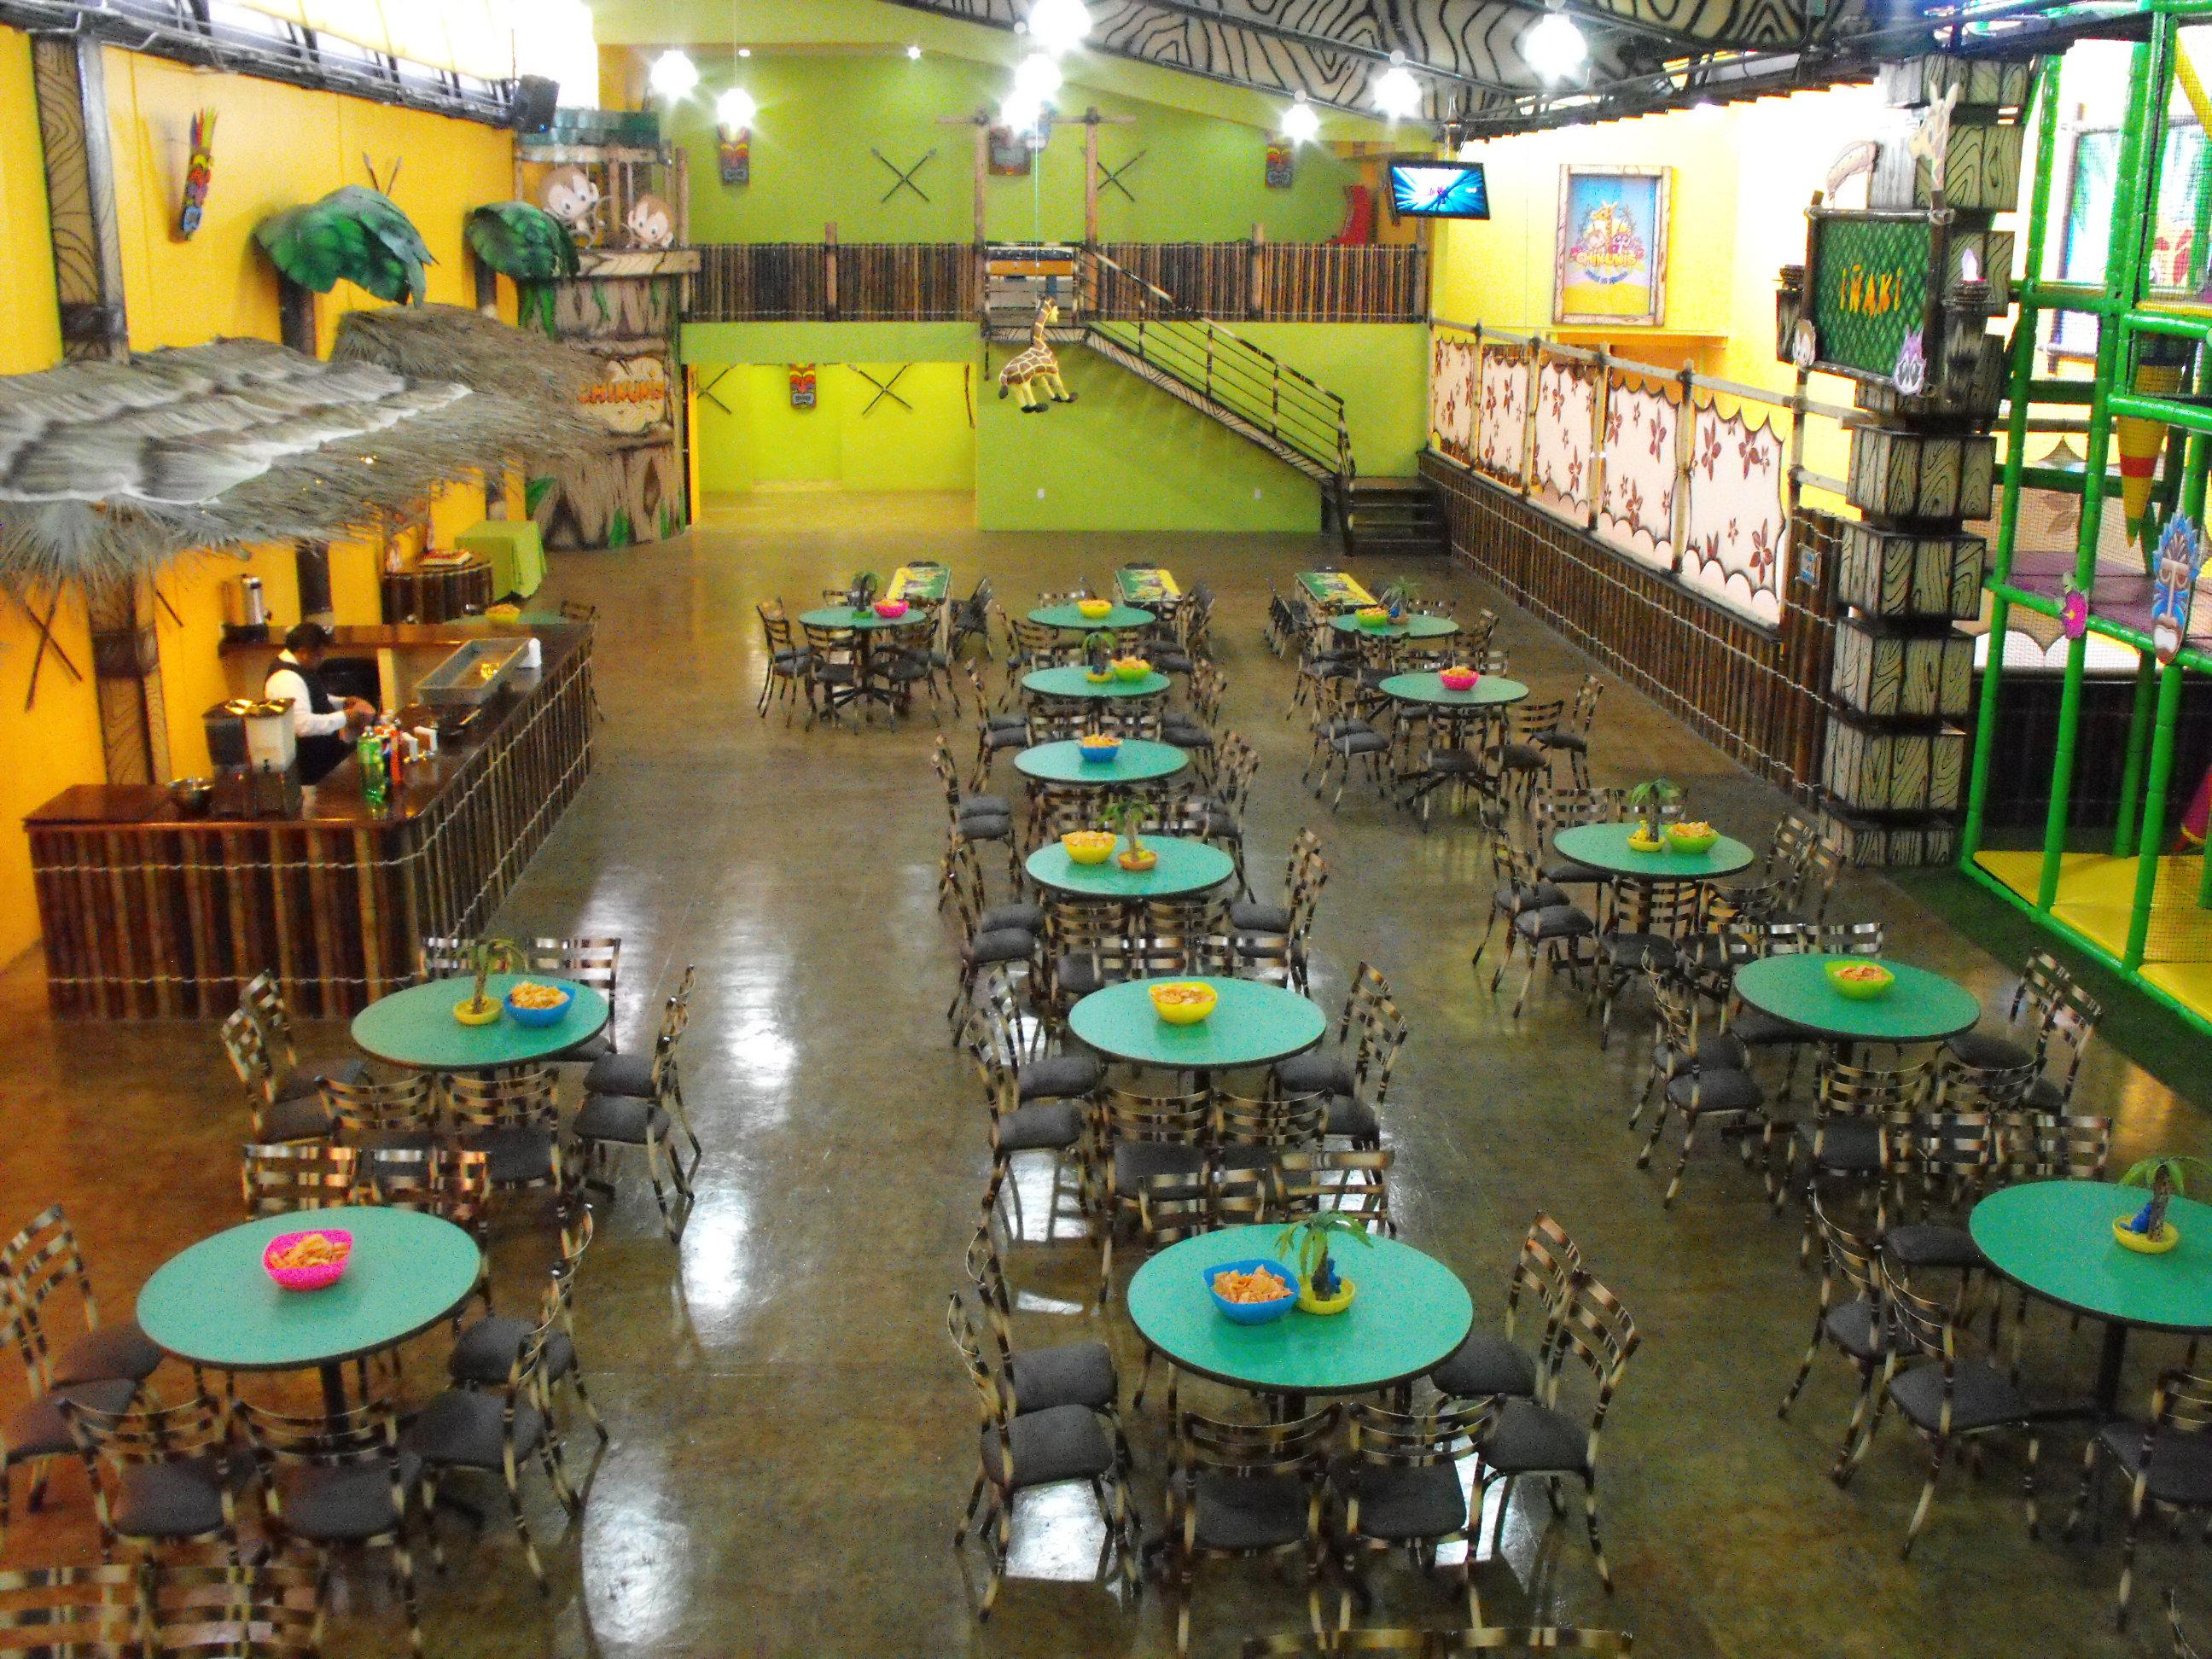 Salon de fiestas infantiles chikukis salones para fiestas for K boom salon de fiestas